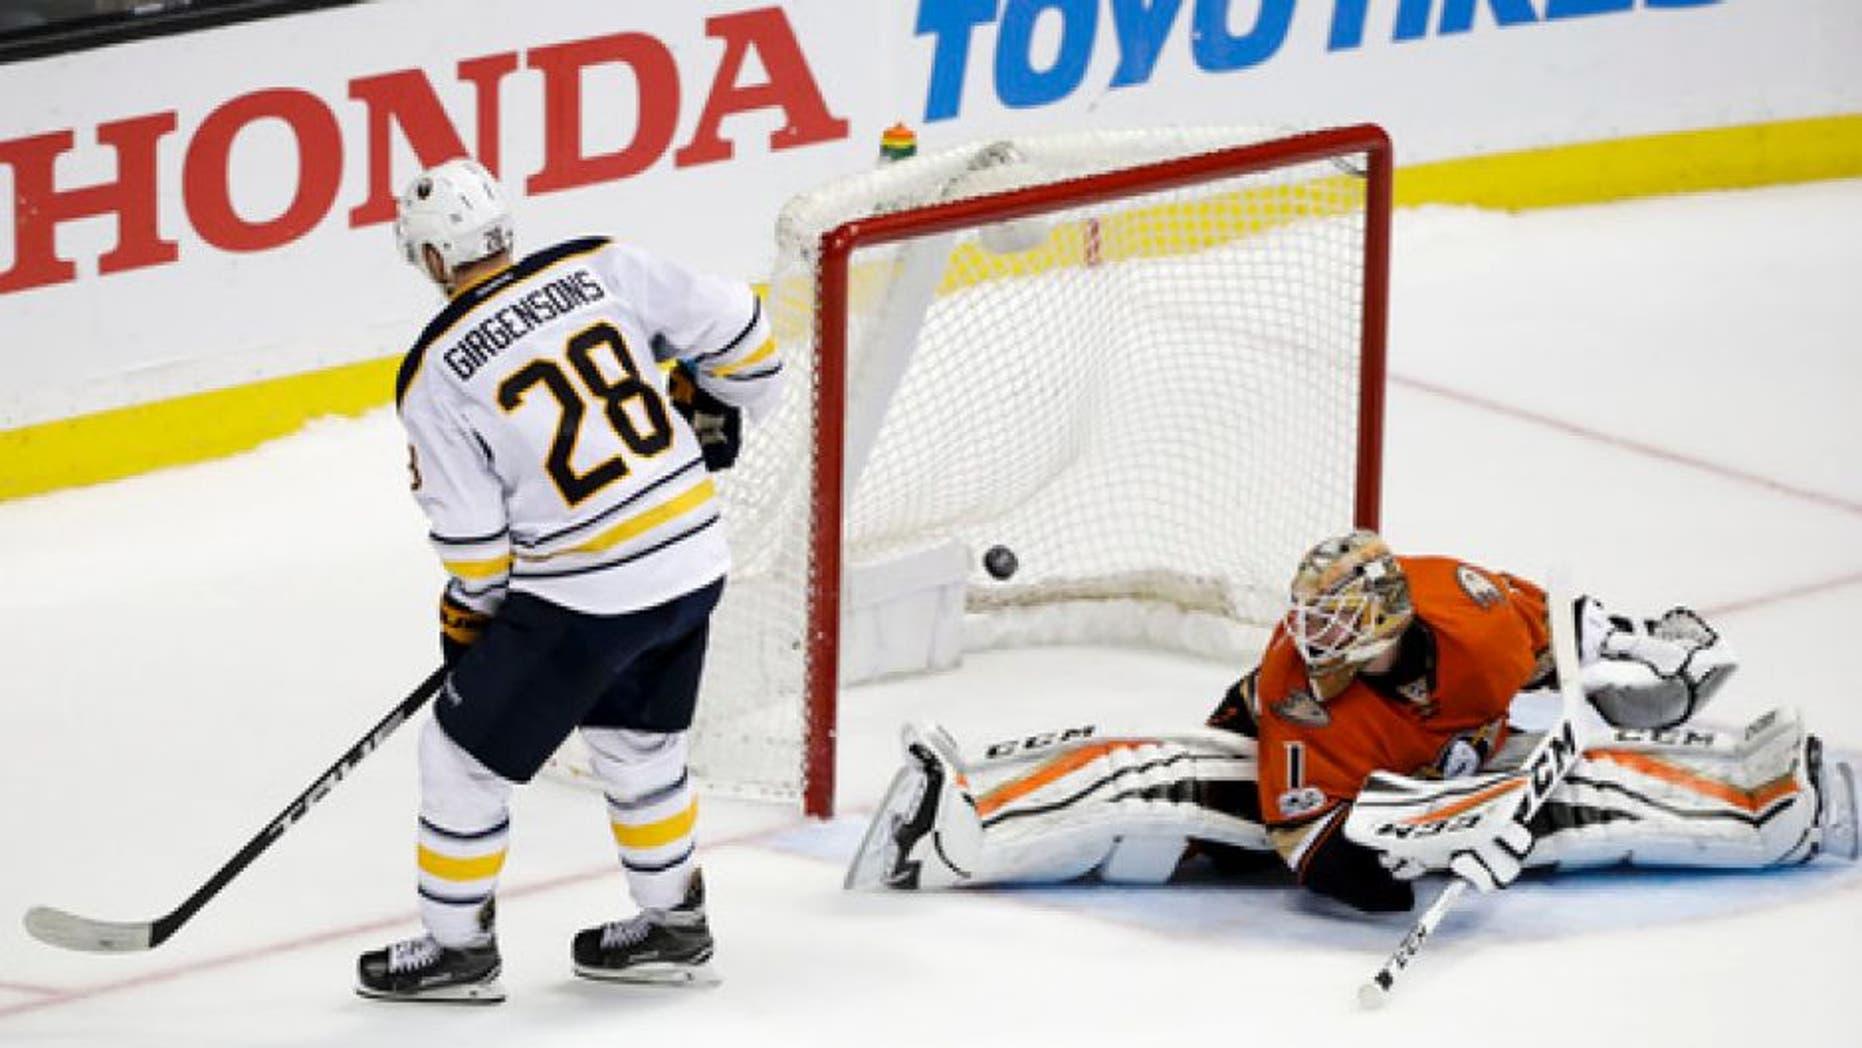 Buffalo Sabres' Zemgus Girgensons, left, of Latvia, scores against Anaheim Ducks goalie Jonathan Bernier during the shootout of an NHL hockey game Friday, March 17, 2017, in Anaheim, Calif. The Sabres won 2-1. (AP Photo/Jae C. Hong)